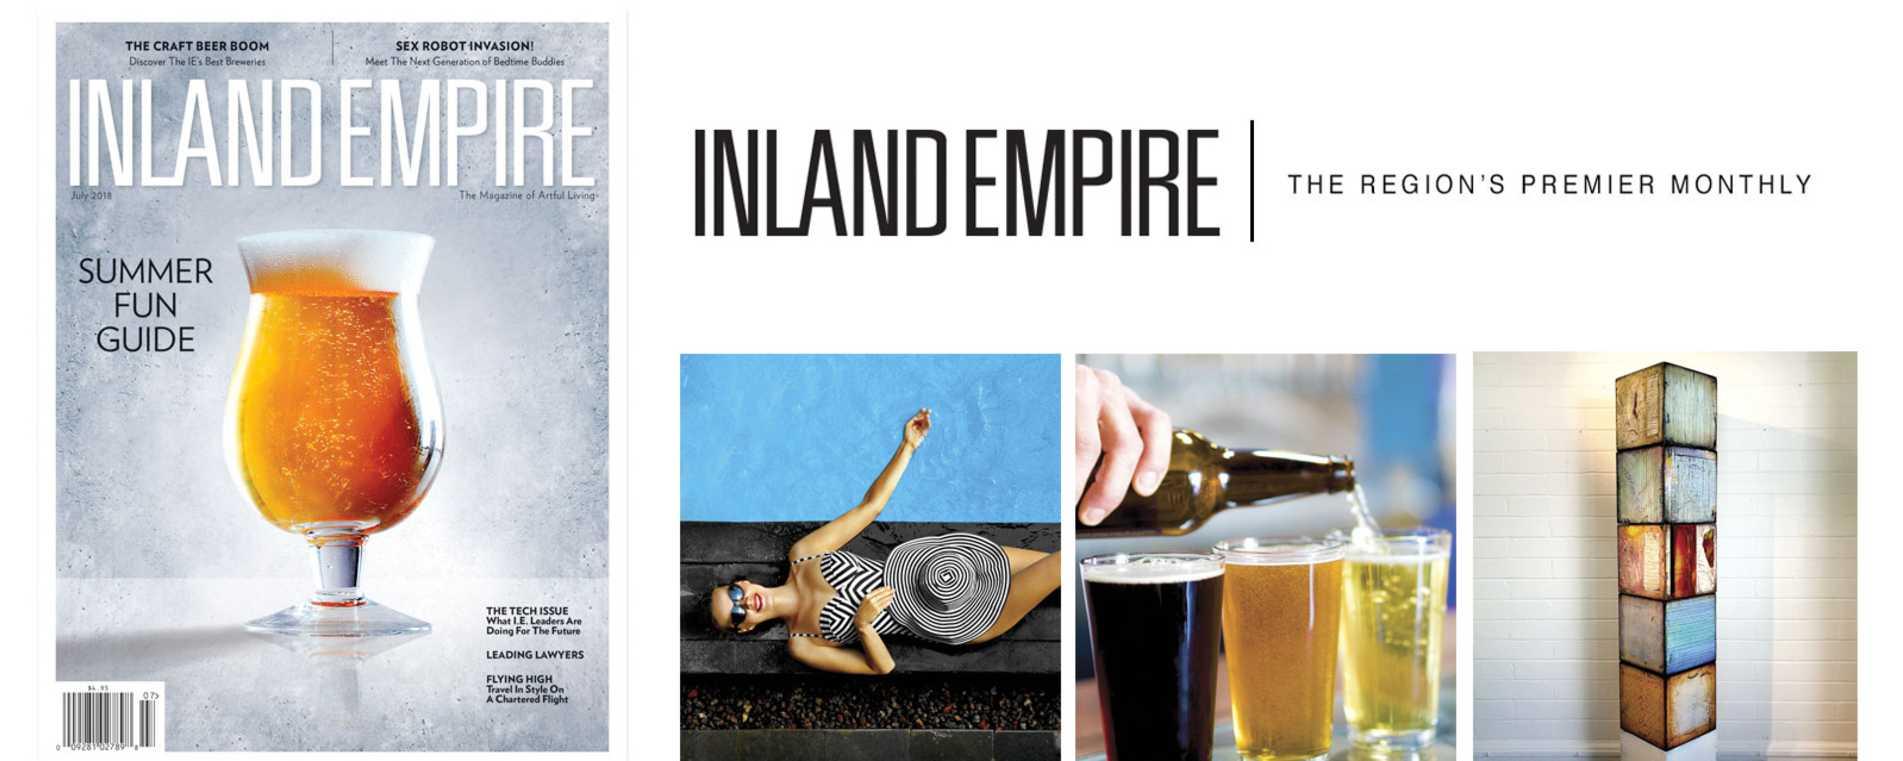 Inland Empire Magazine